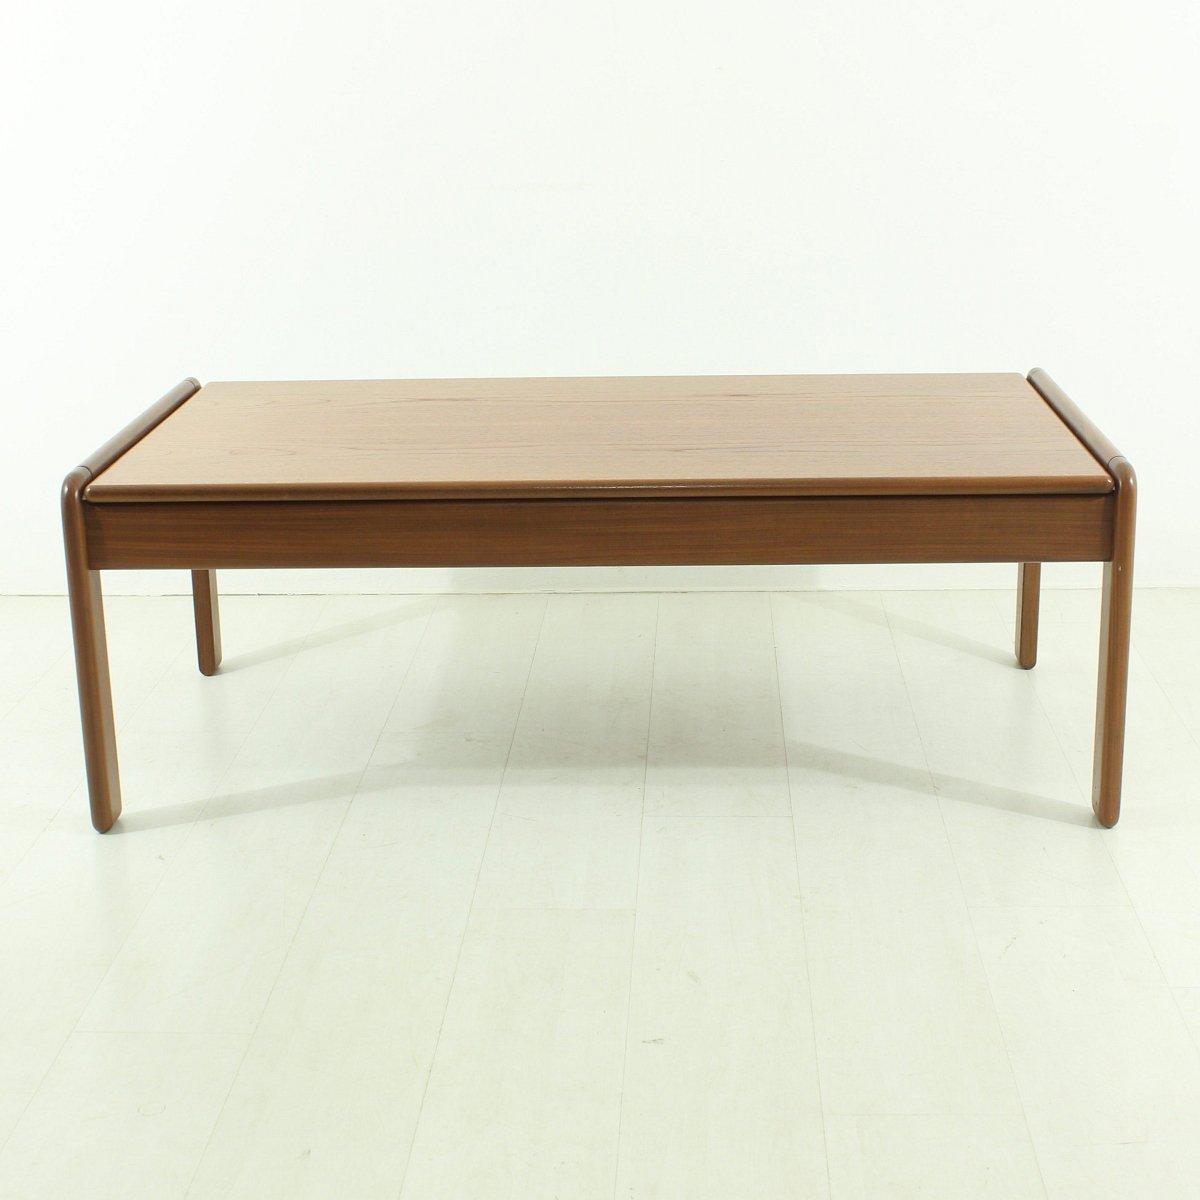 skandinavischer teak couchtisch 1960er bei pamono kaufen. Black Bedroom Furniture Sets. Home Design Ideas